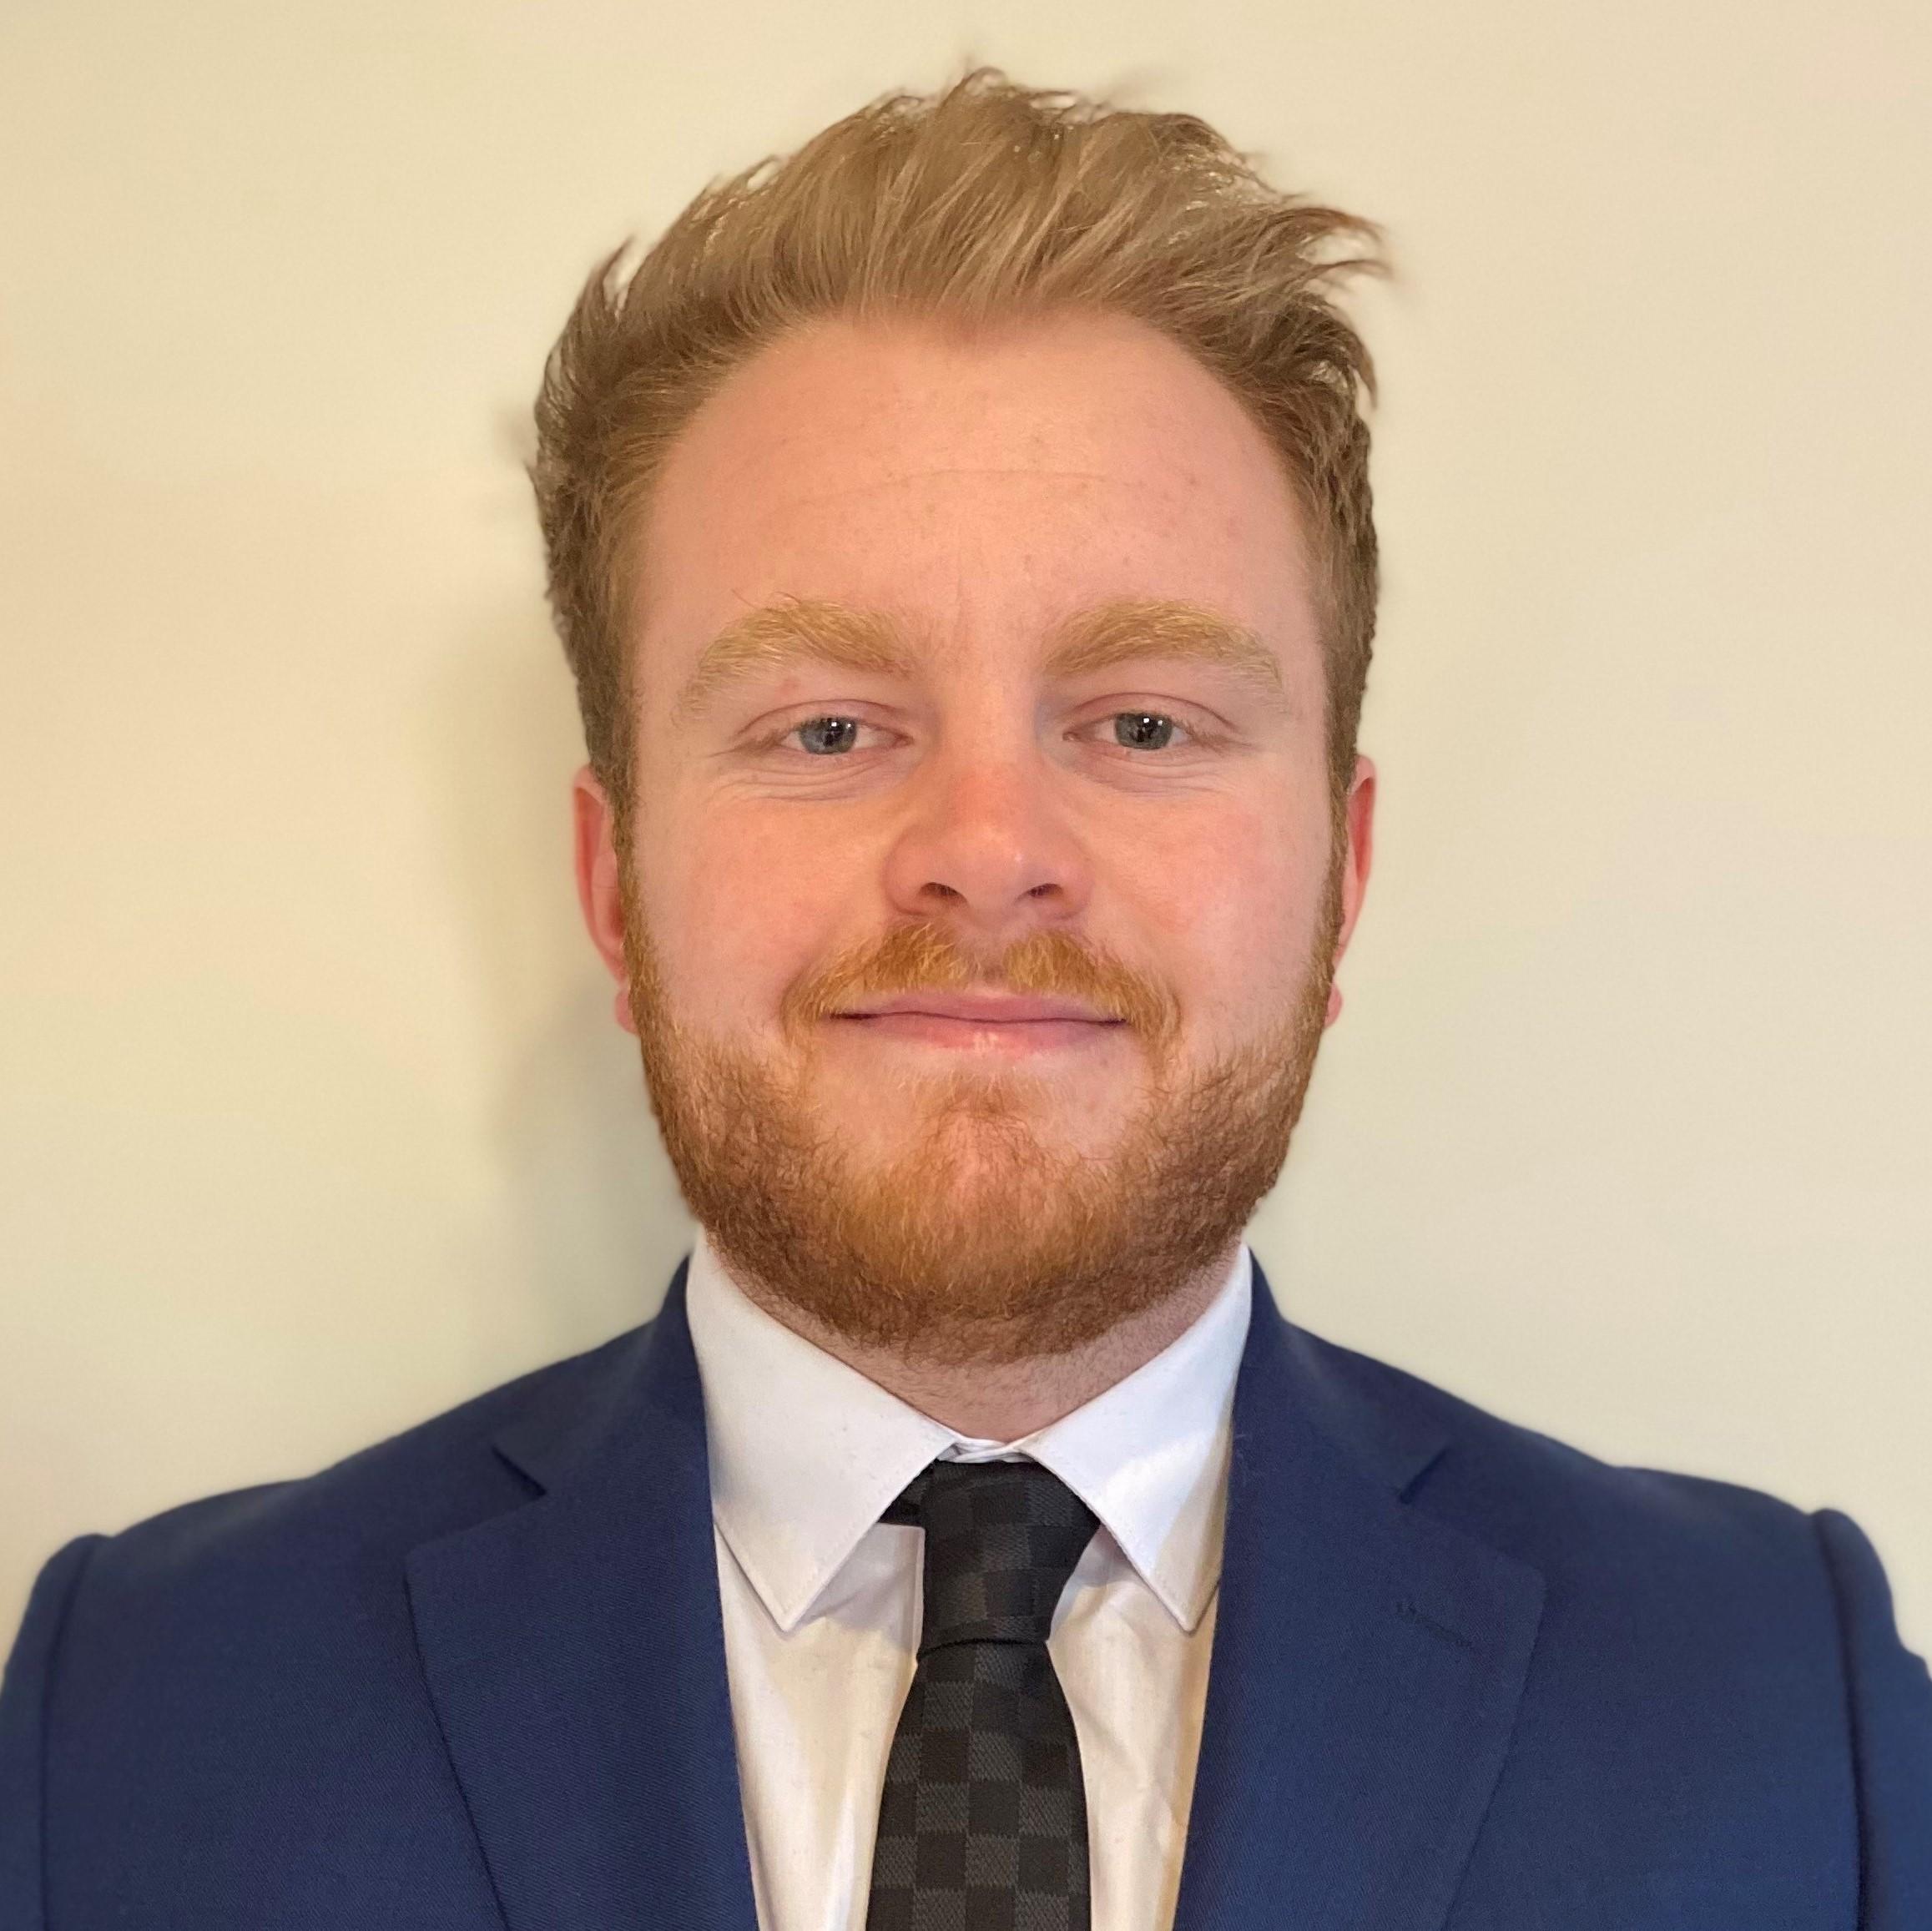 profile picture of samuel ashworth-jones